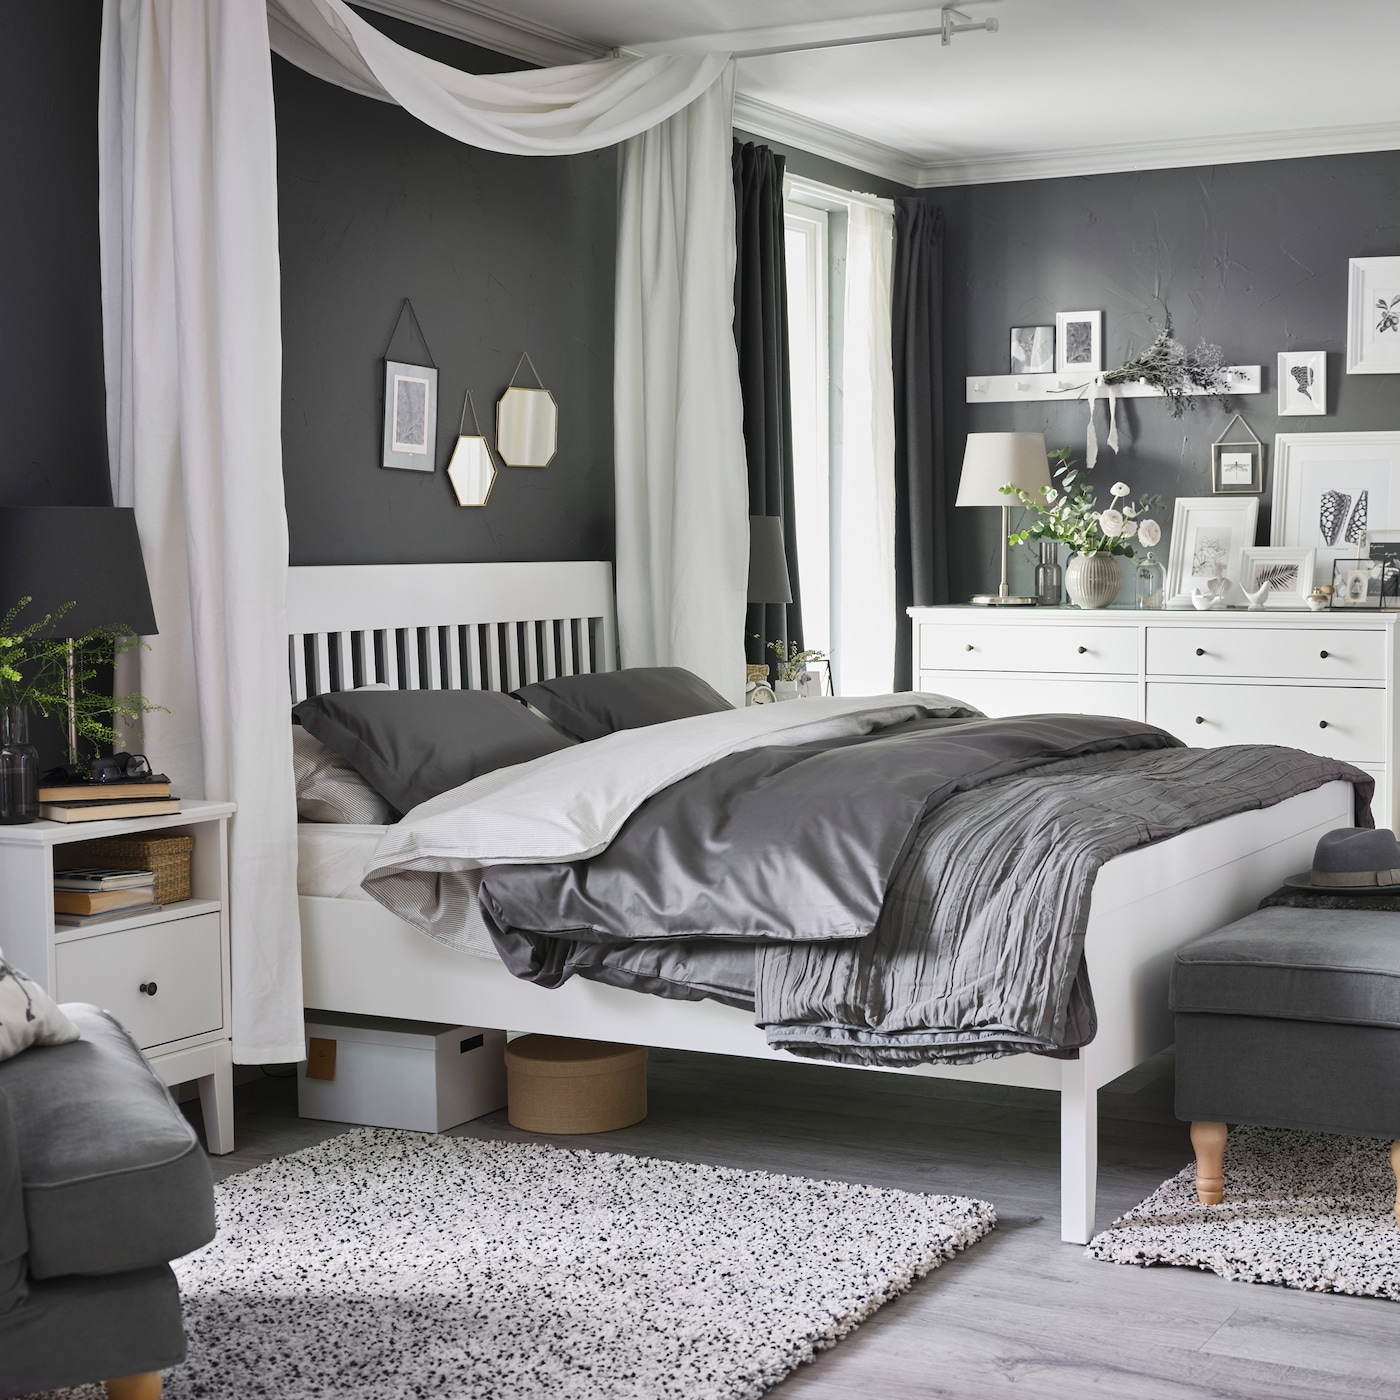 ofertas dormitorios matrimonio ikea